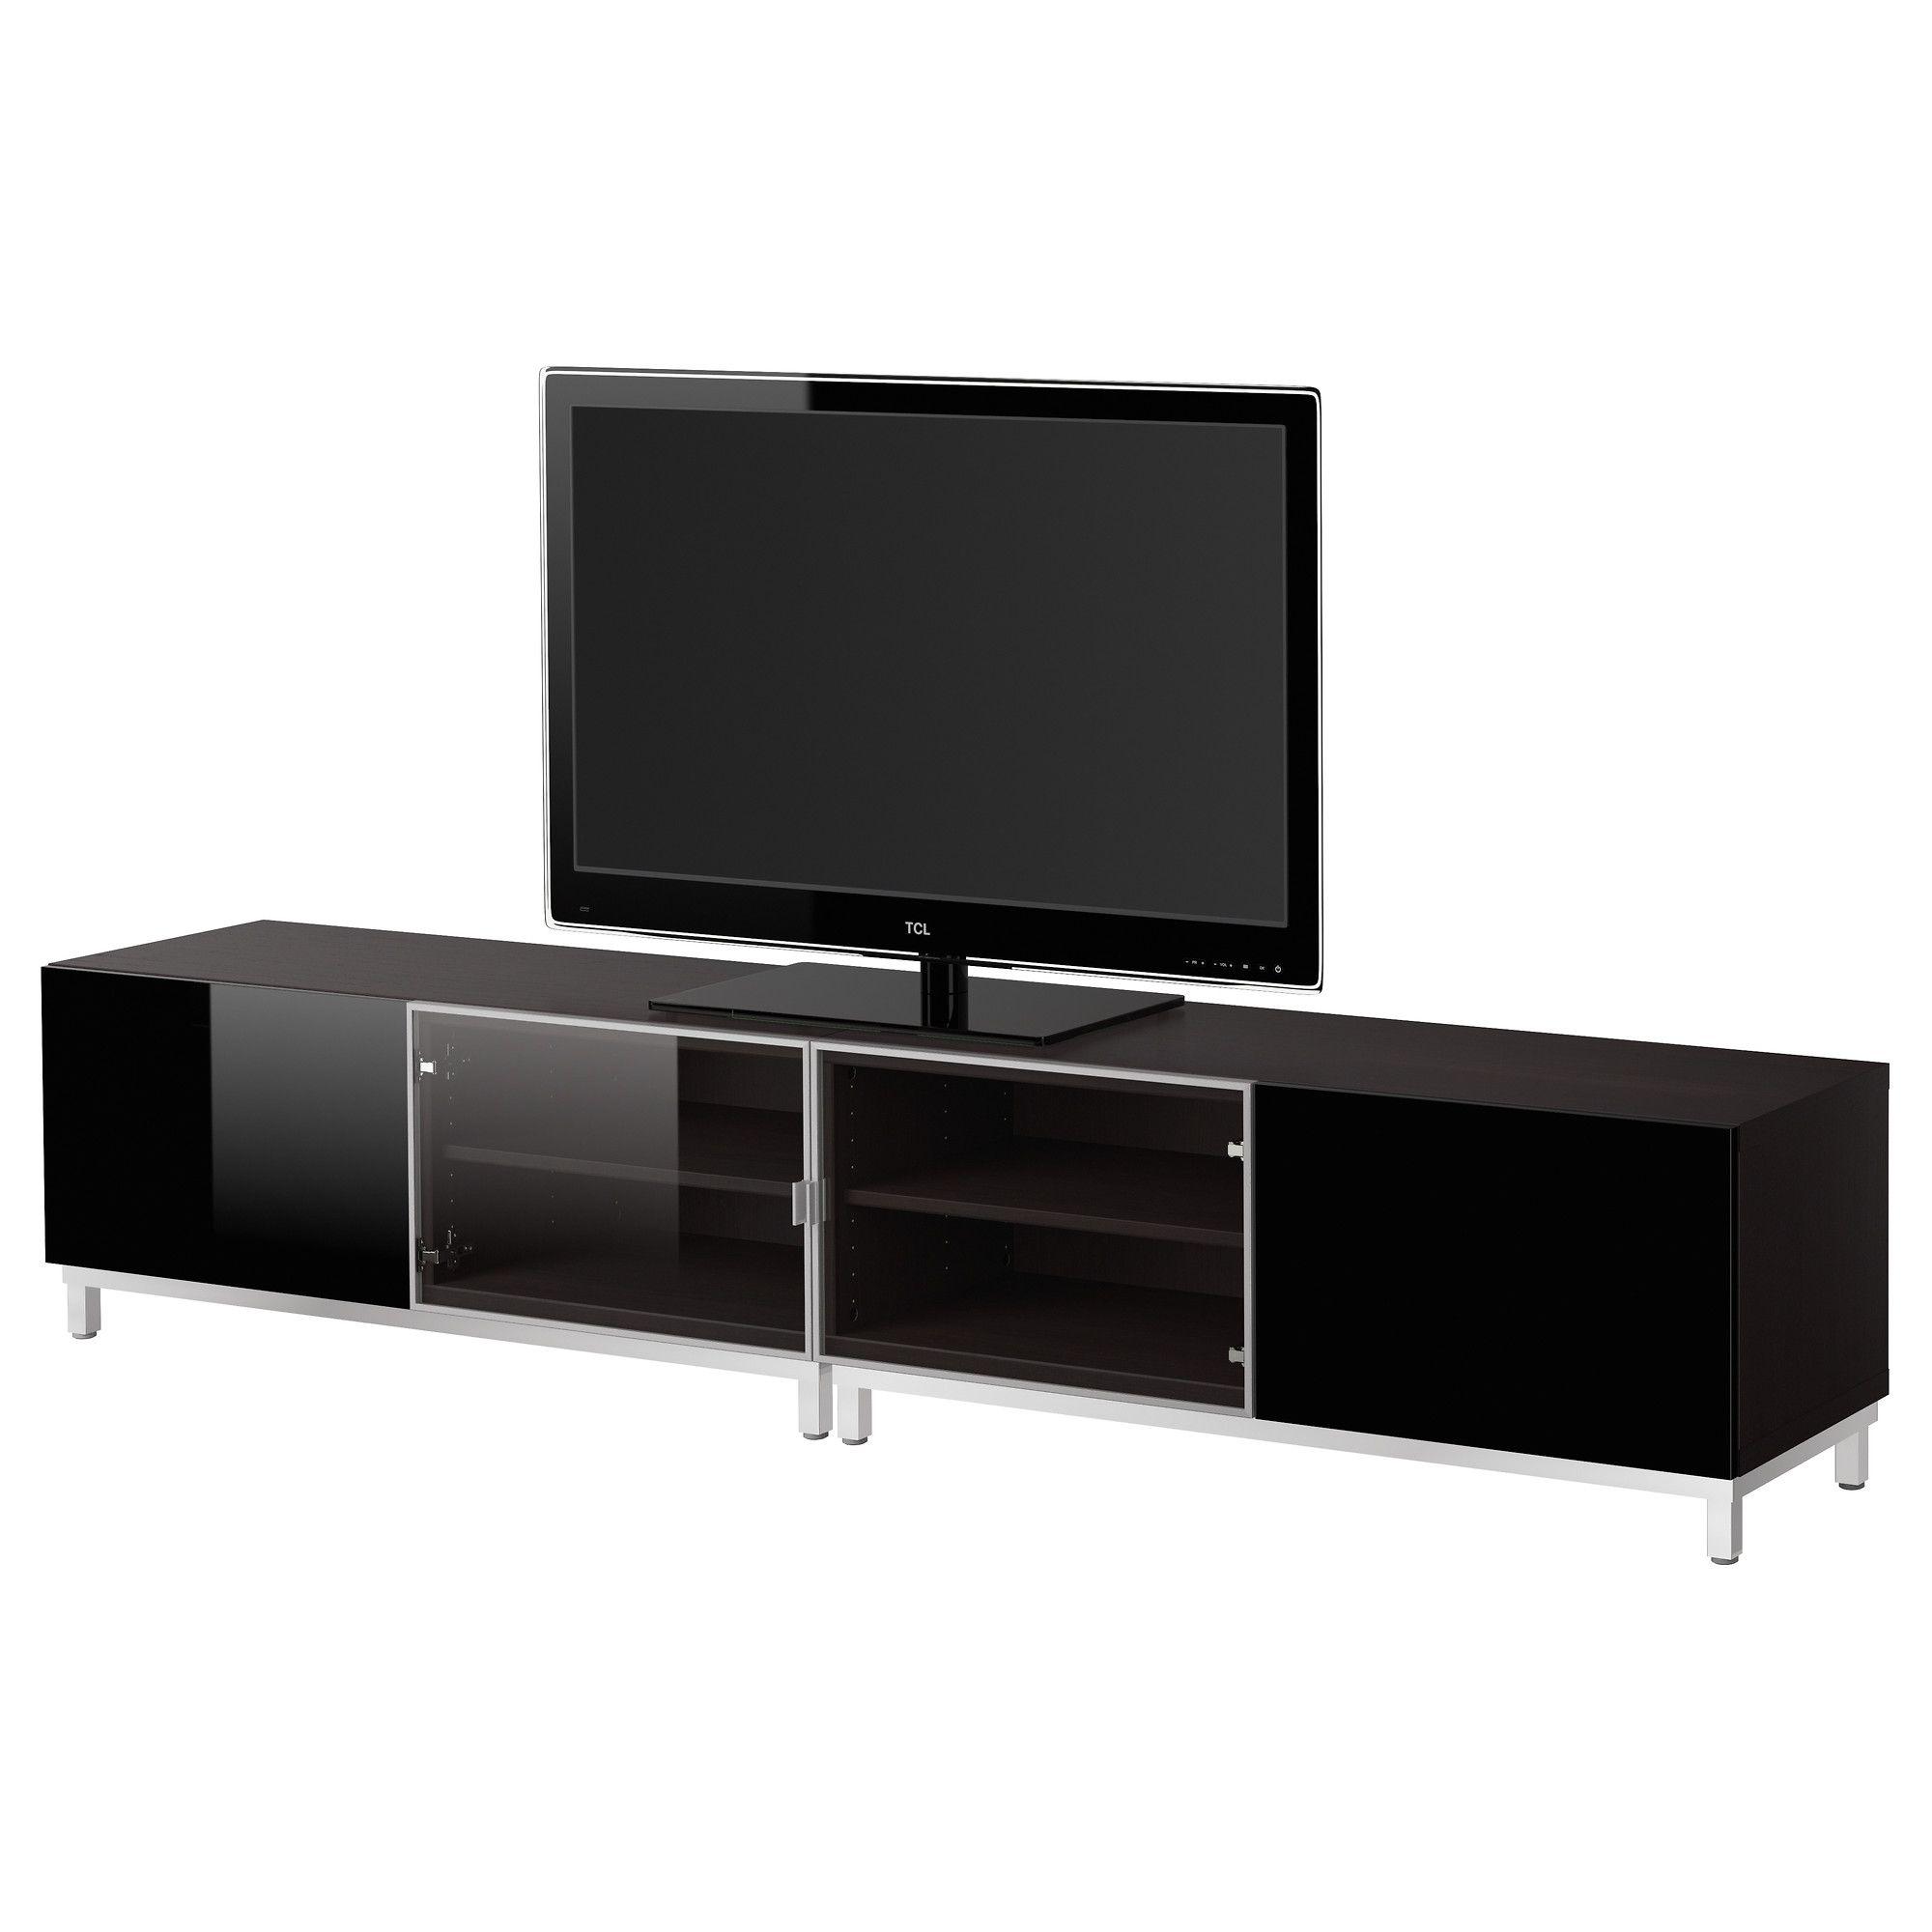 Best Tv Bench With Glass Doors Black Brownhigh Gloss Black